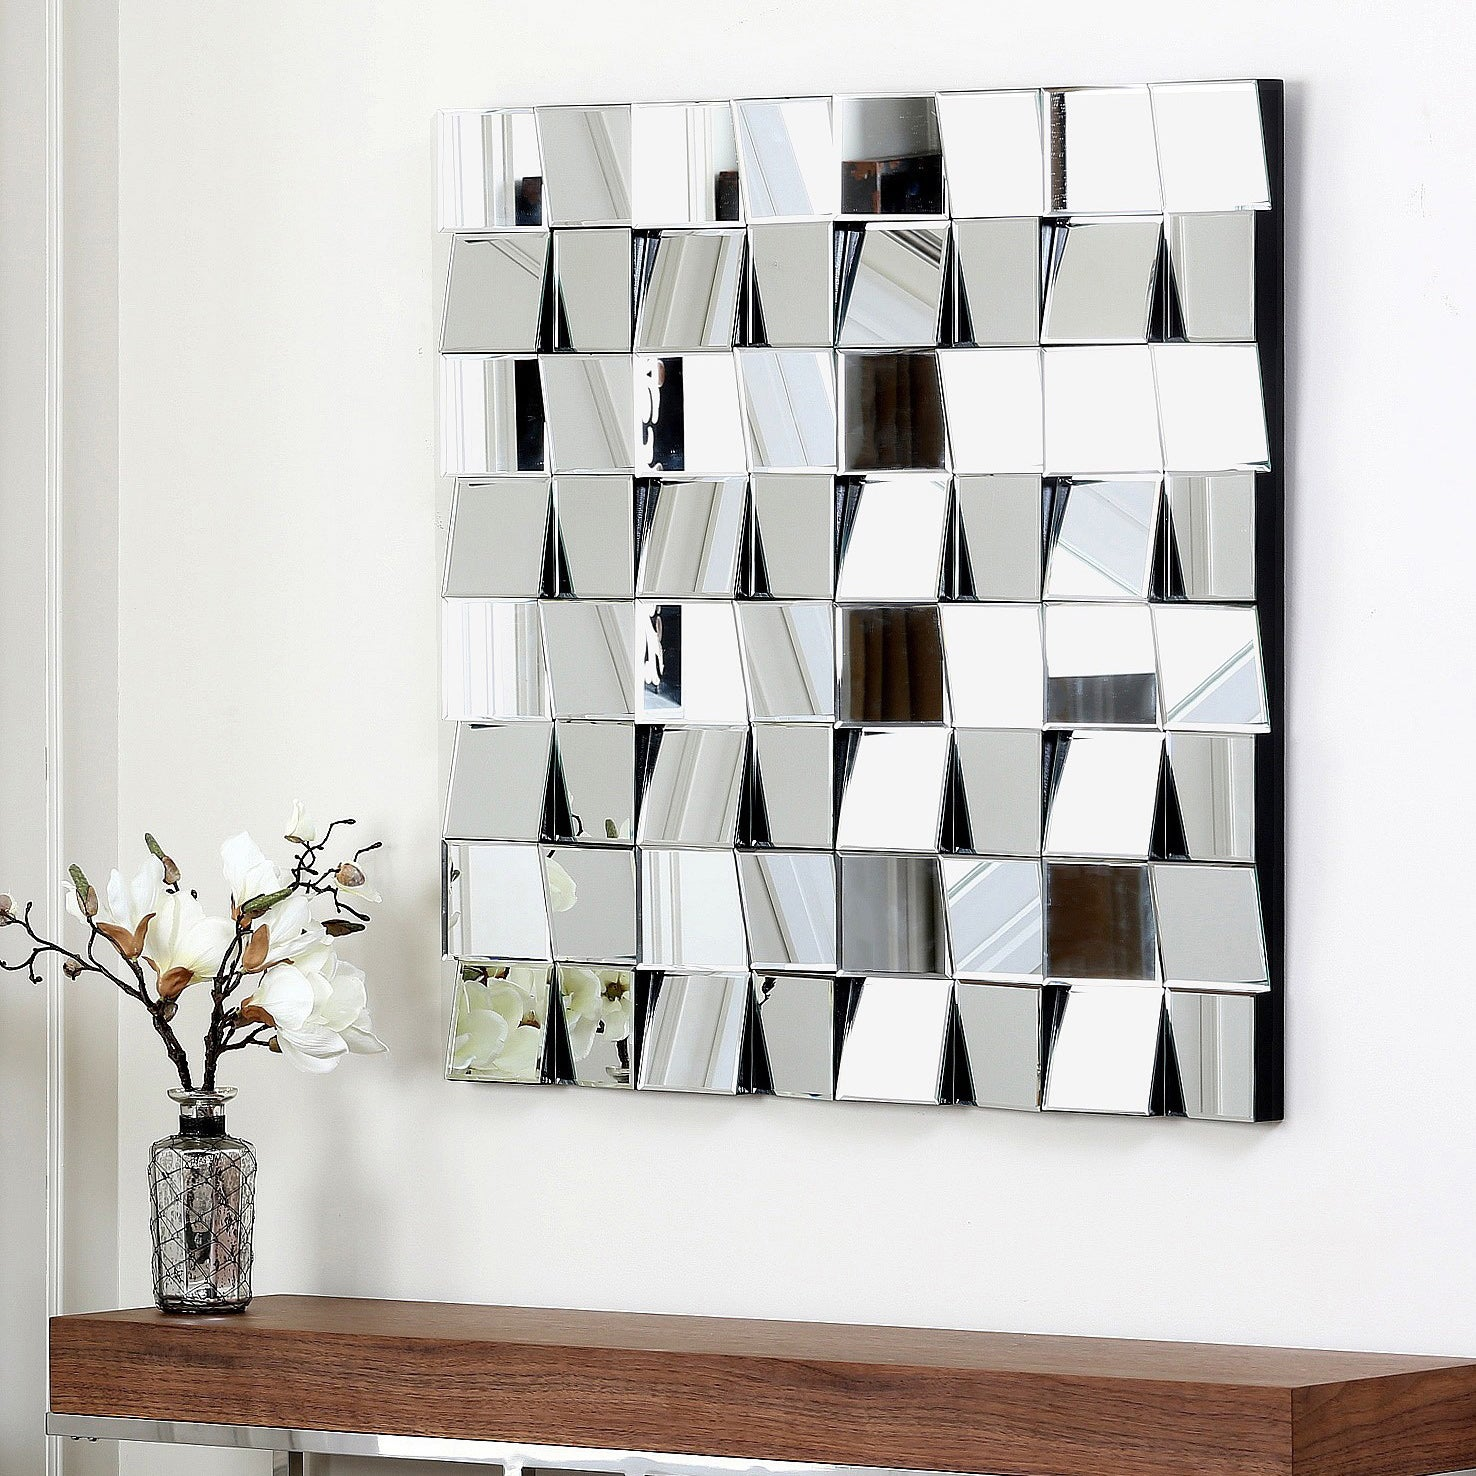 Abbyson Living Isabella Square Wall Mirror at Sears.com